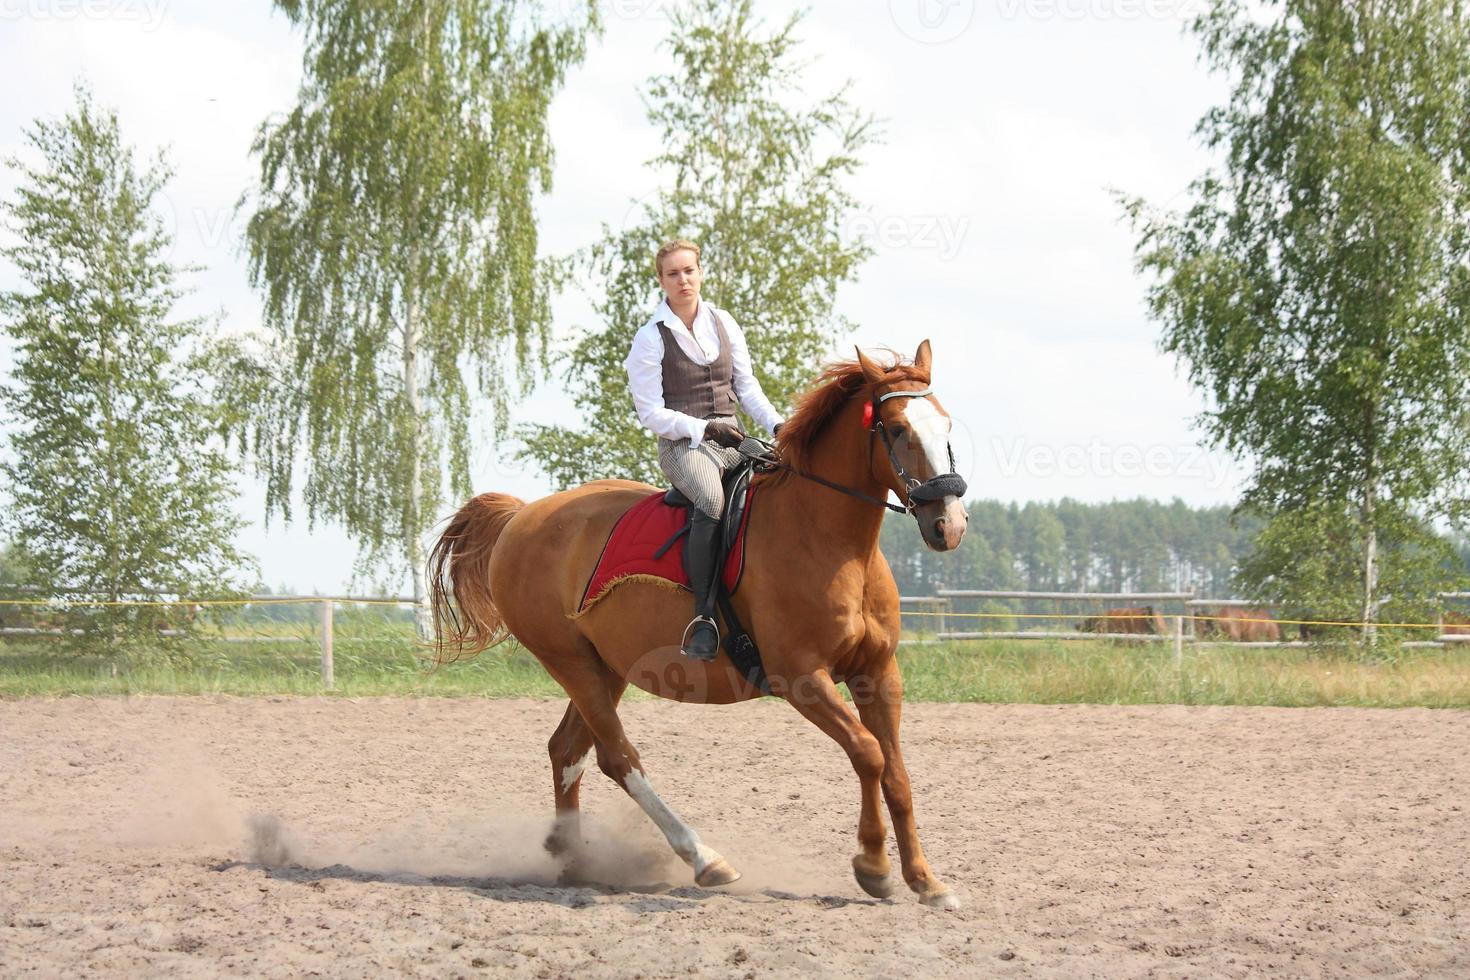 hermosa joven rubia montando caballo castaño foto